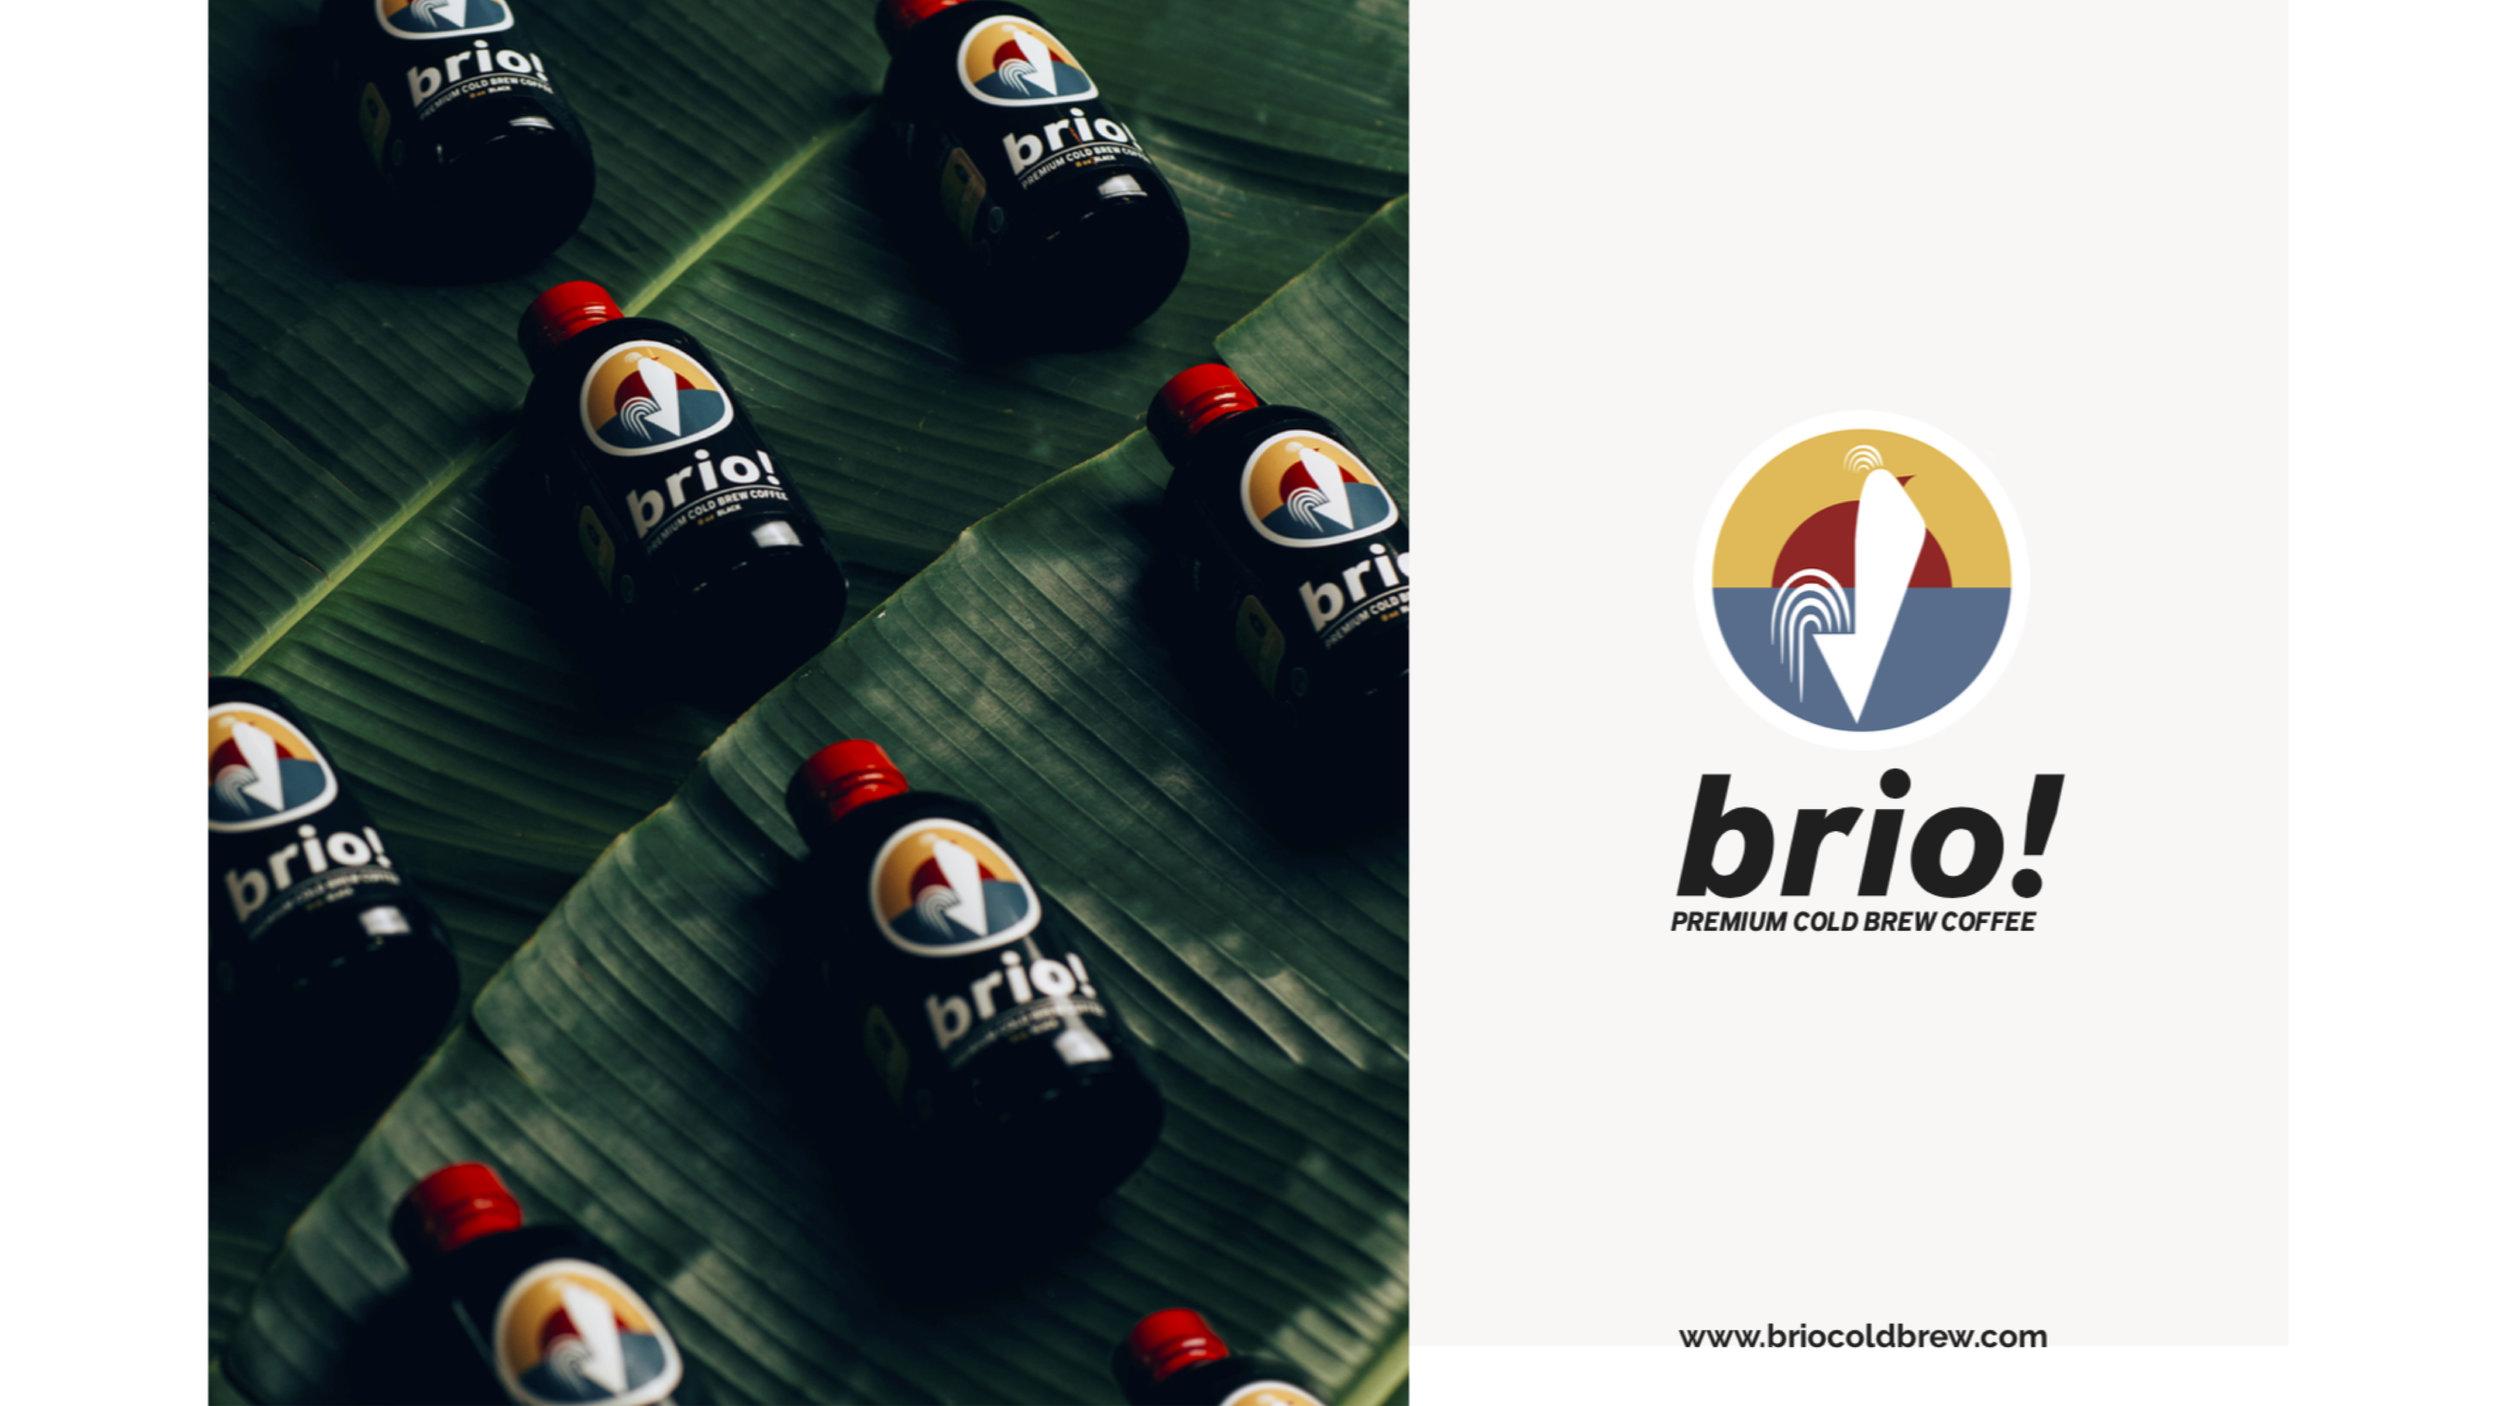 brio!_Pitch Deck_12062018-1.jpg